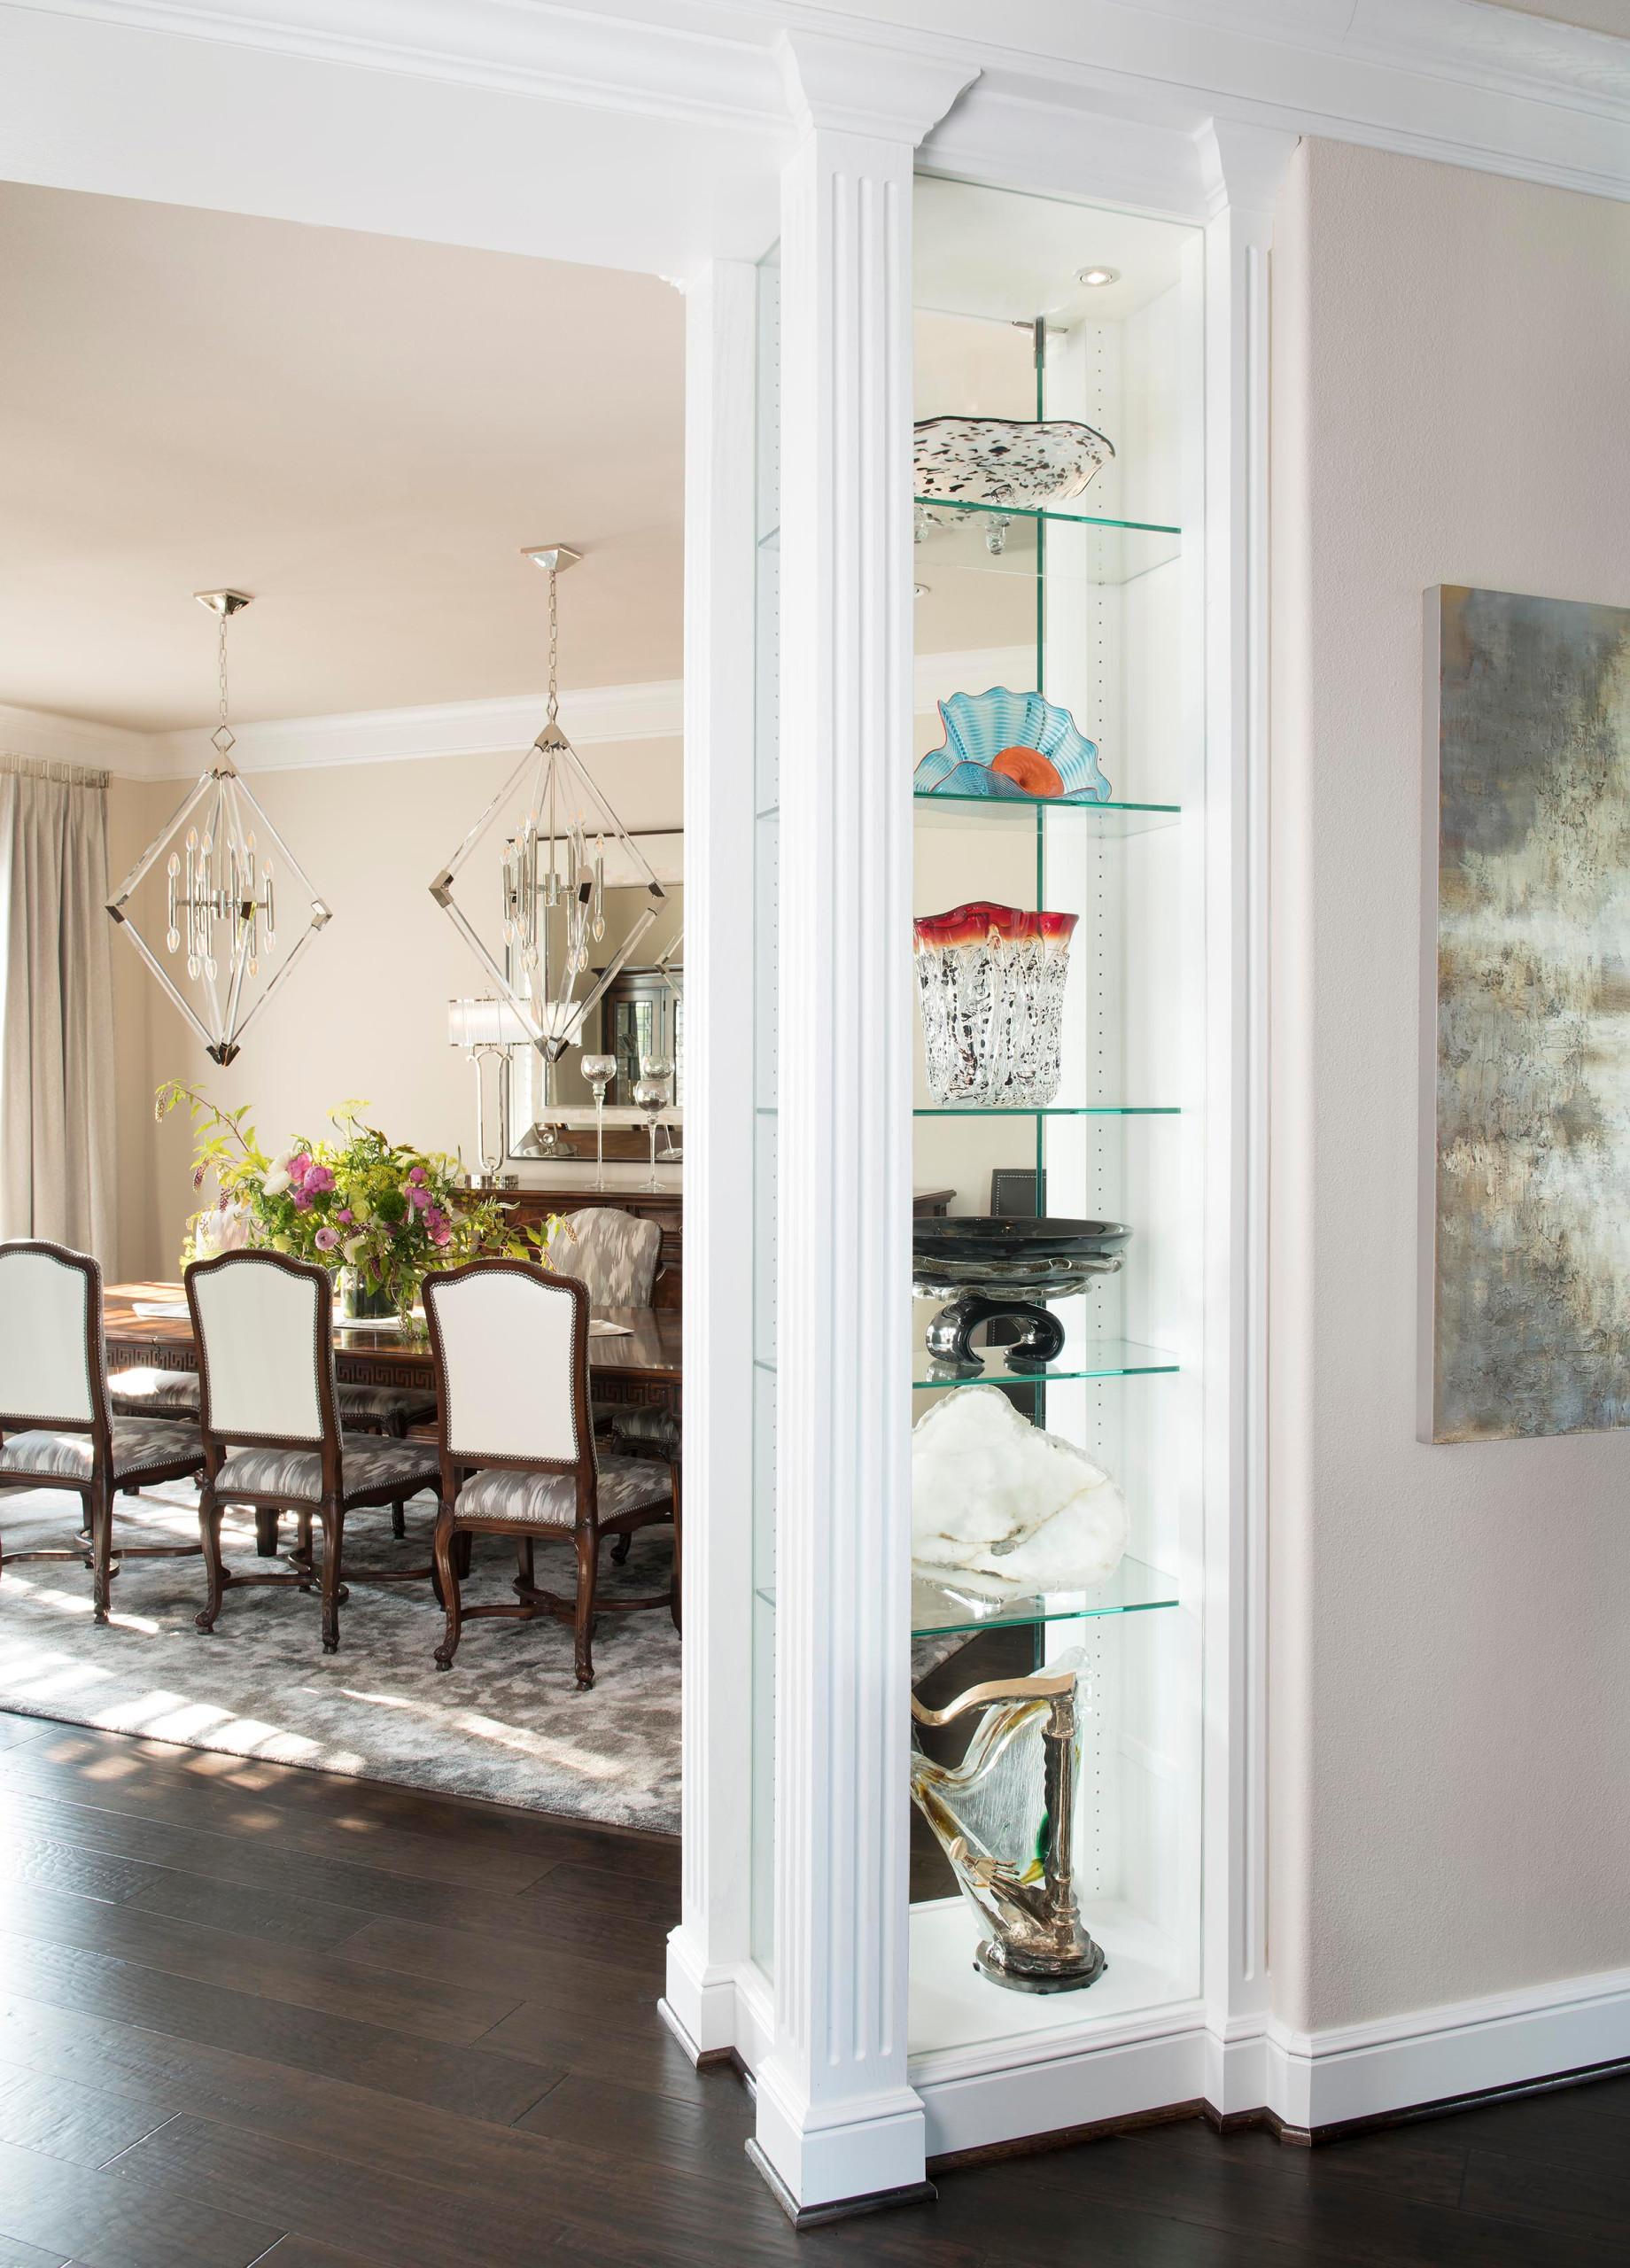 Modern Mediterranean Dining Room with Display Shelves